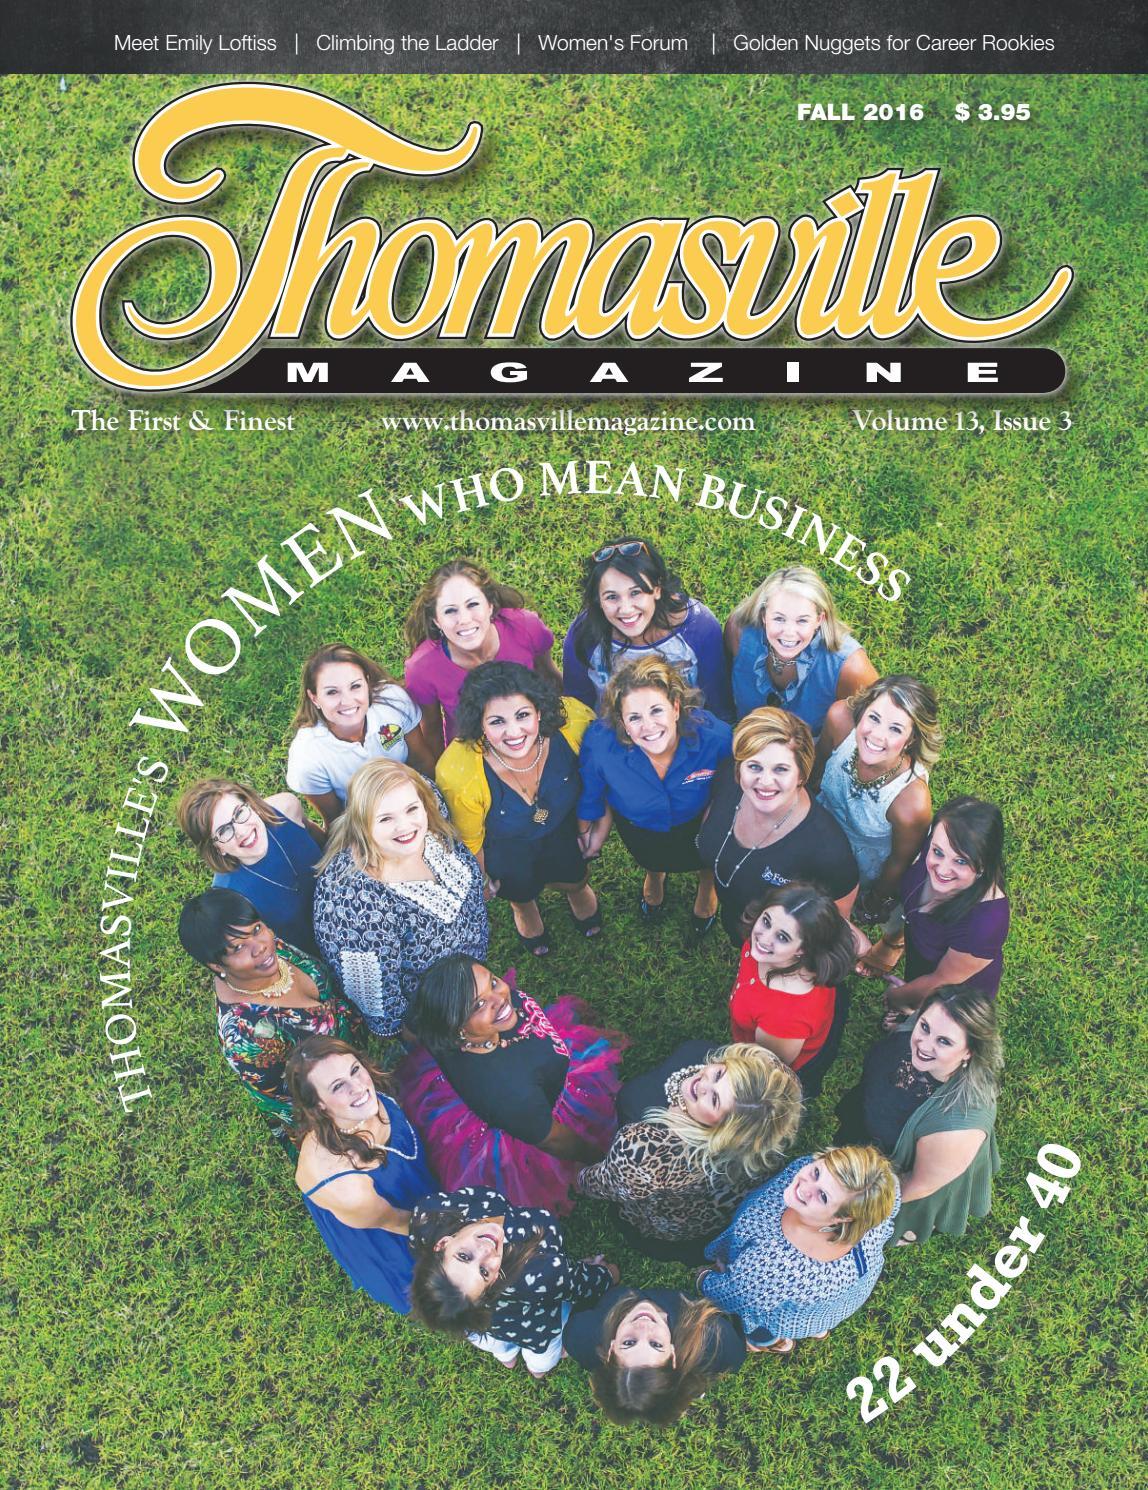 Thomasville Magazine Fall 2016 Issue by ThomasvilleMagazine issuu